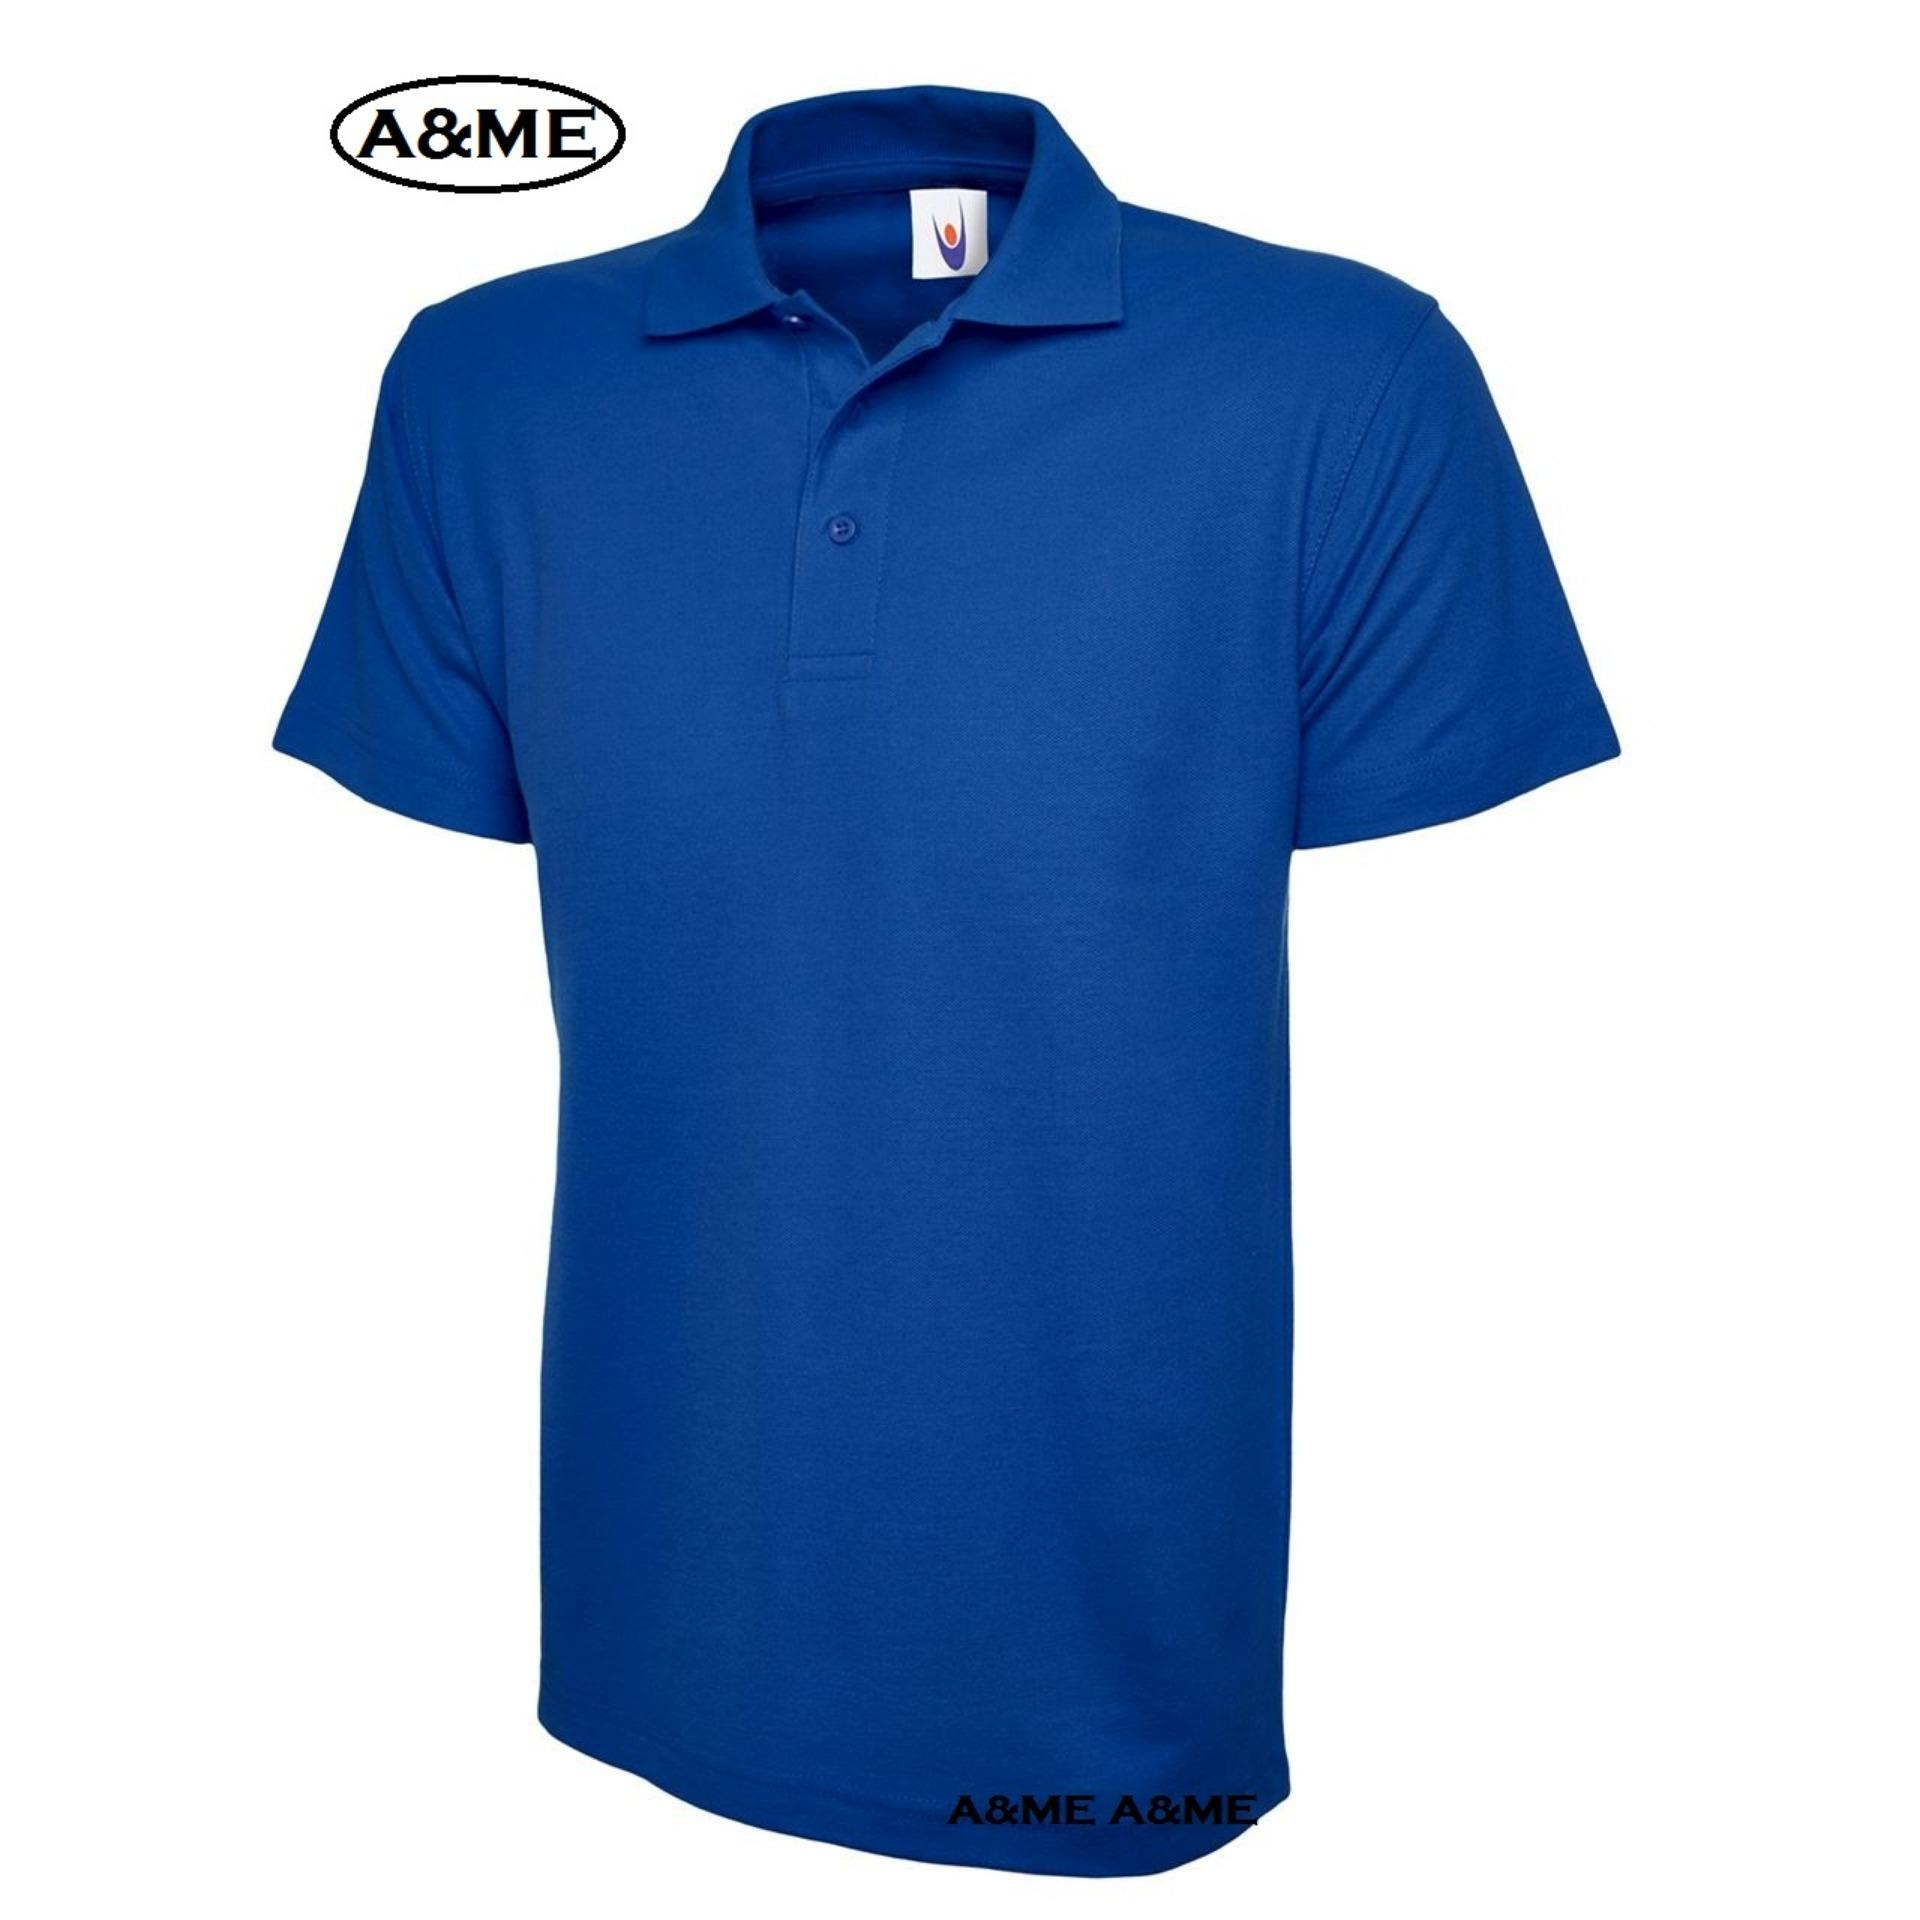 Harga A Me Kaos Polo Shirt M L Xl Lengan Pendek Baju Pakaian Olah Raga Kaos Kerah Atasan Pria Wanita Lacos Pique Fashion Keren Nyaman Bagus Simple Biru 02 Terbaik